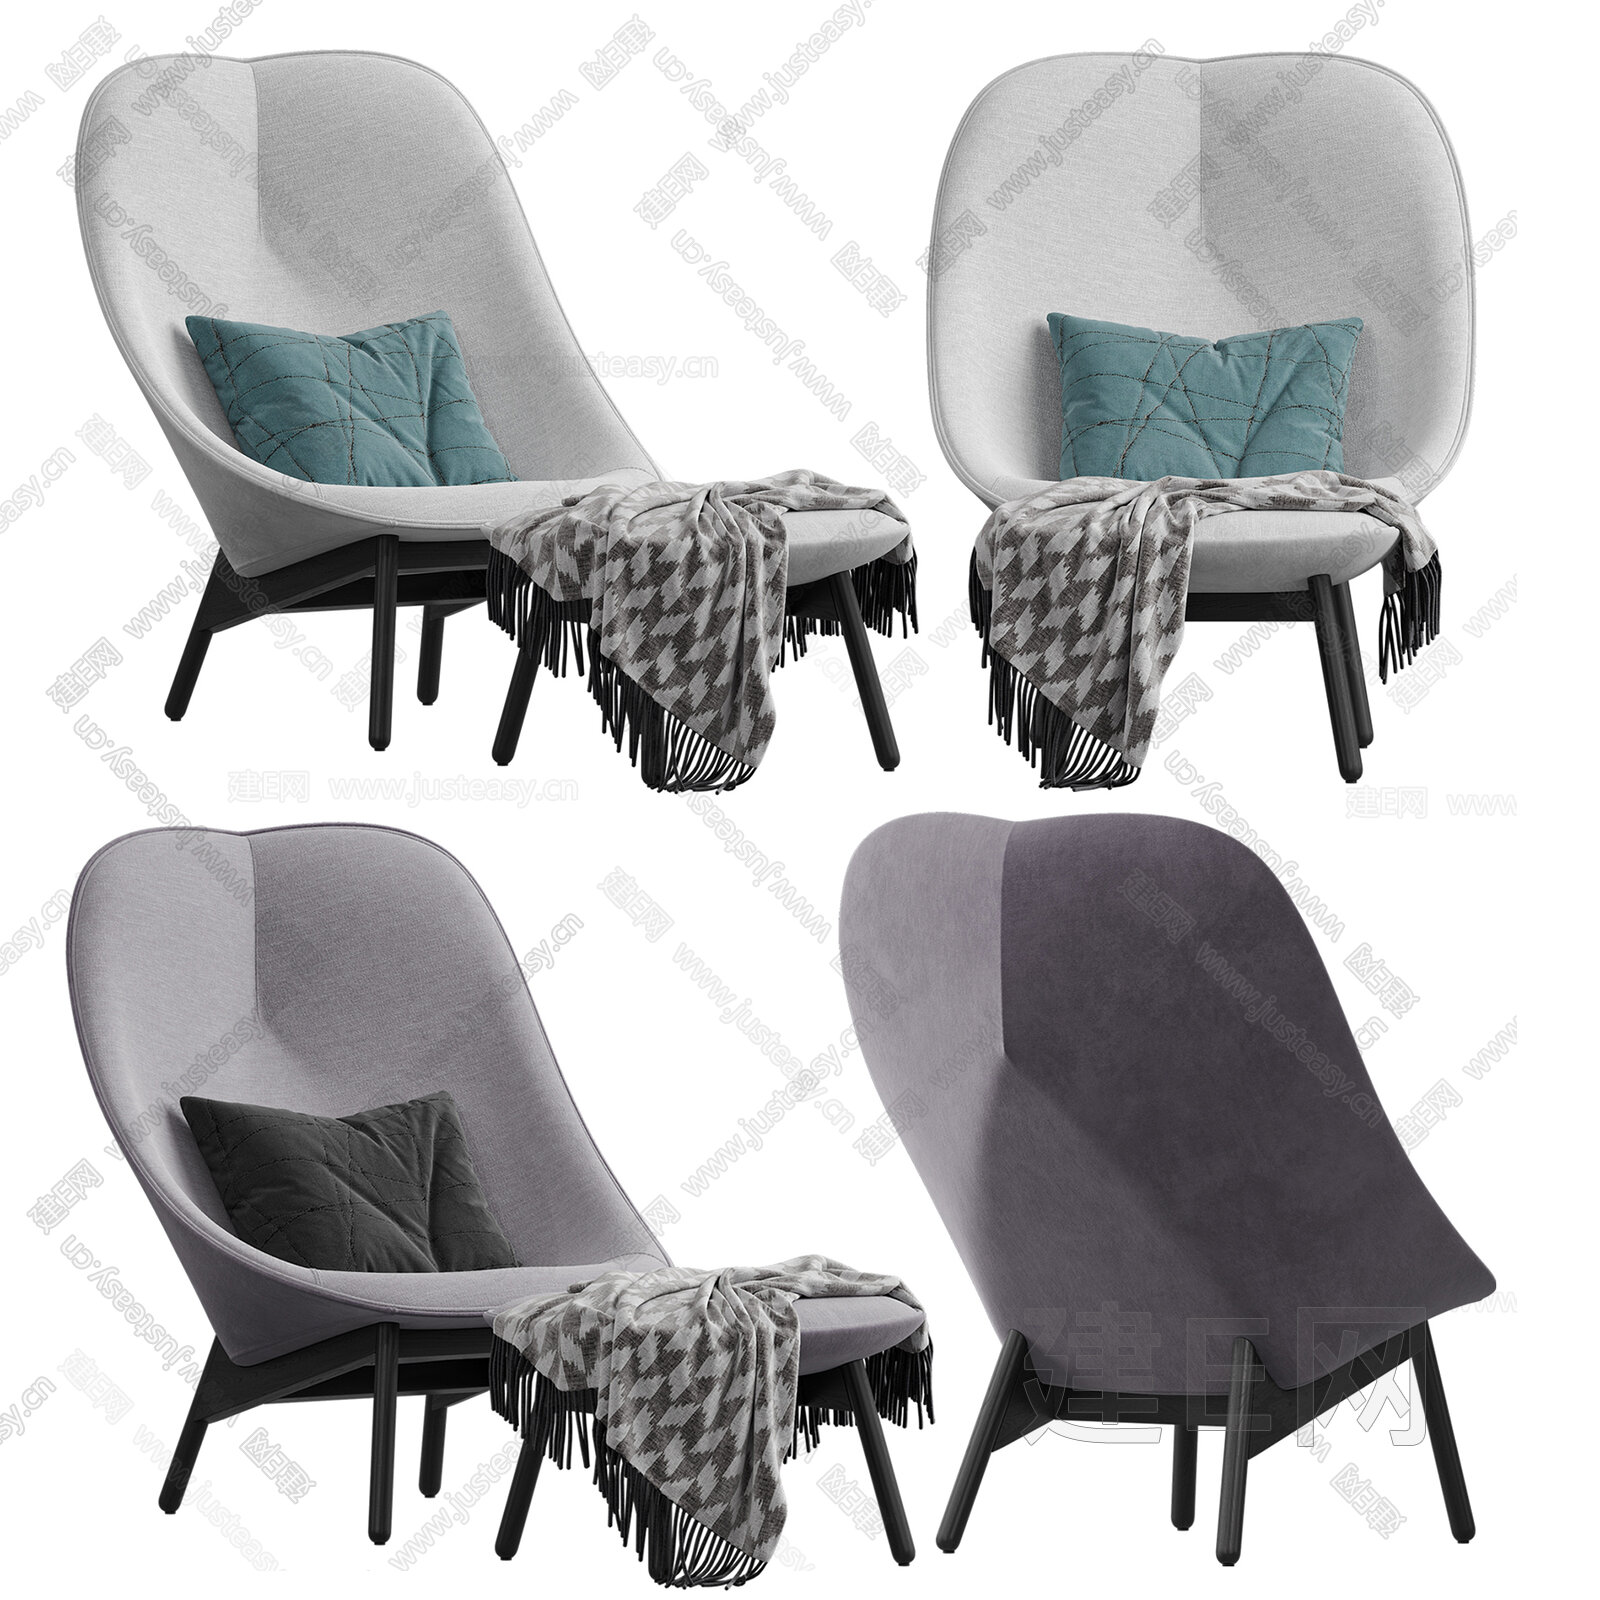 Hay 现代休闲椅3d模型